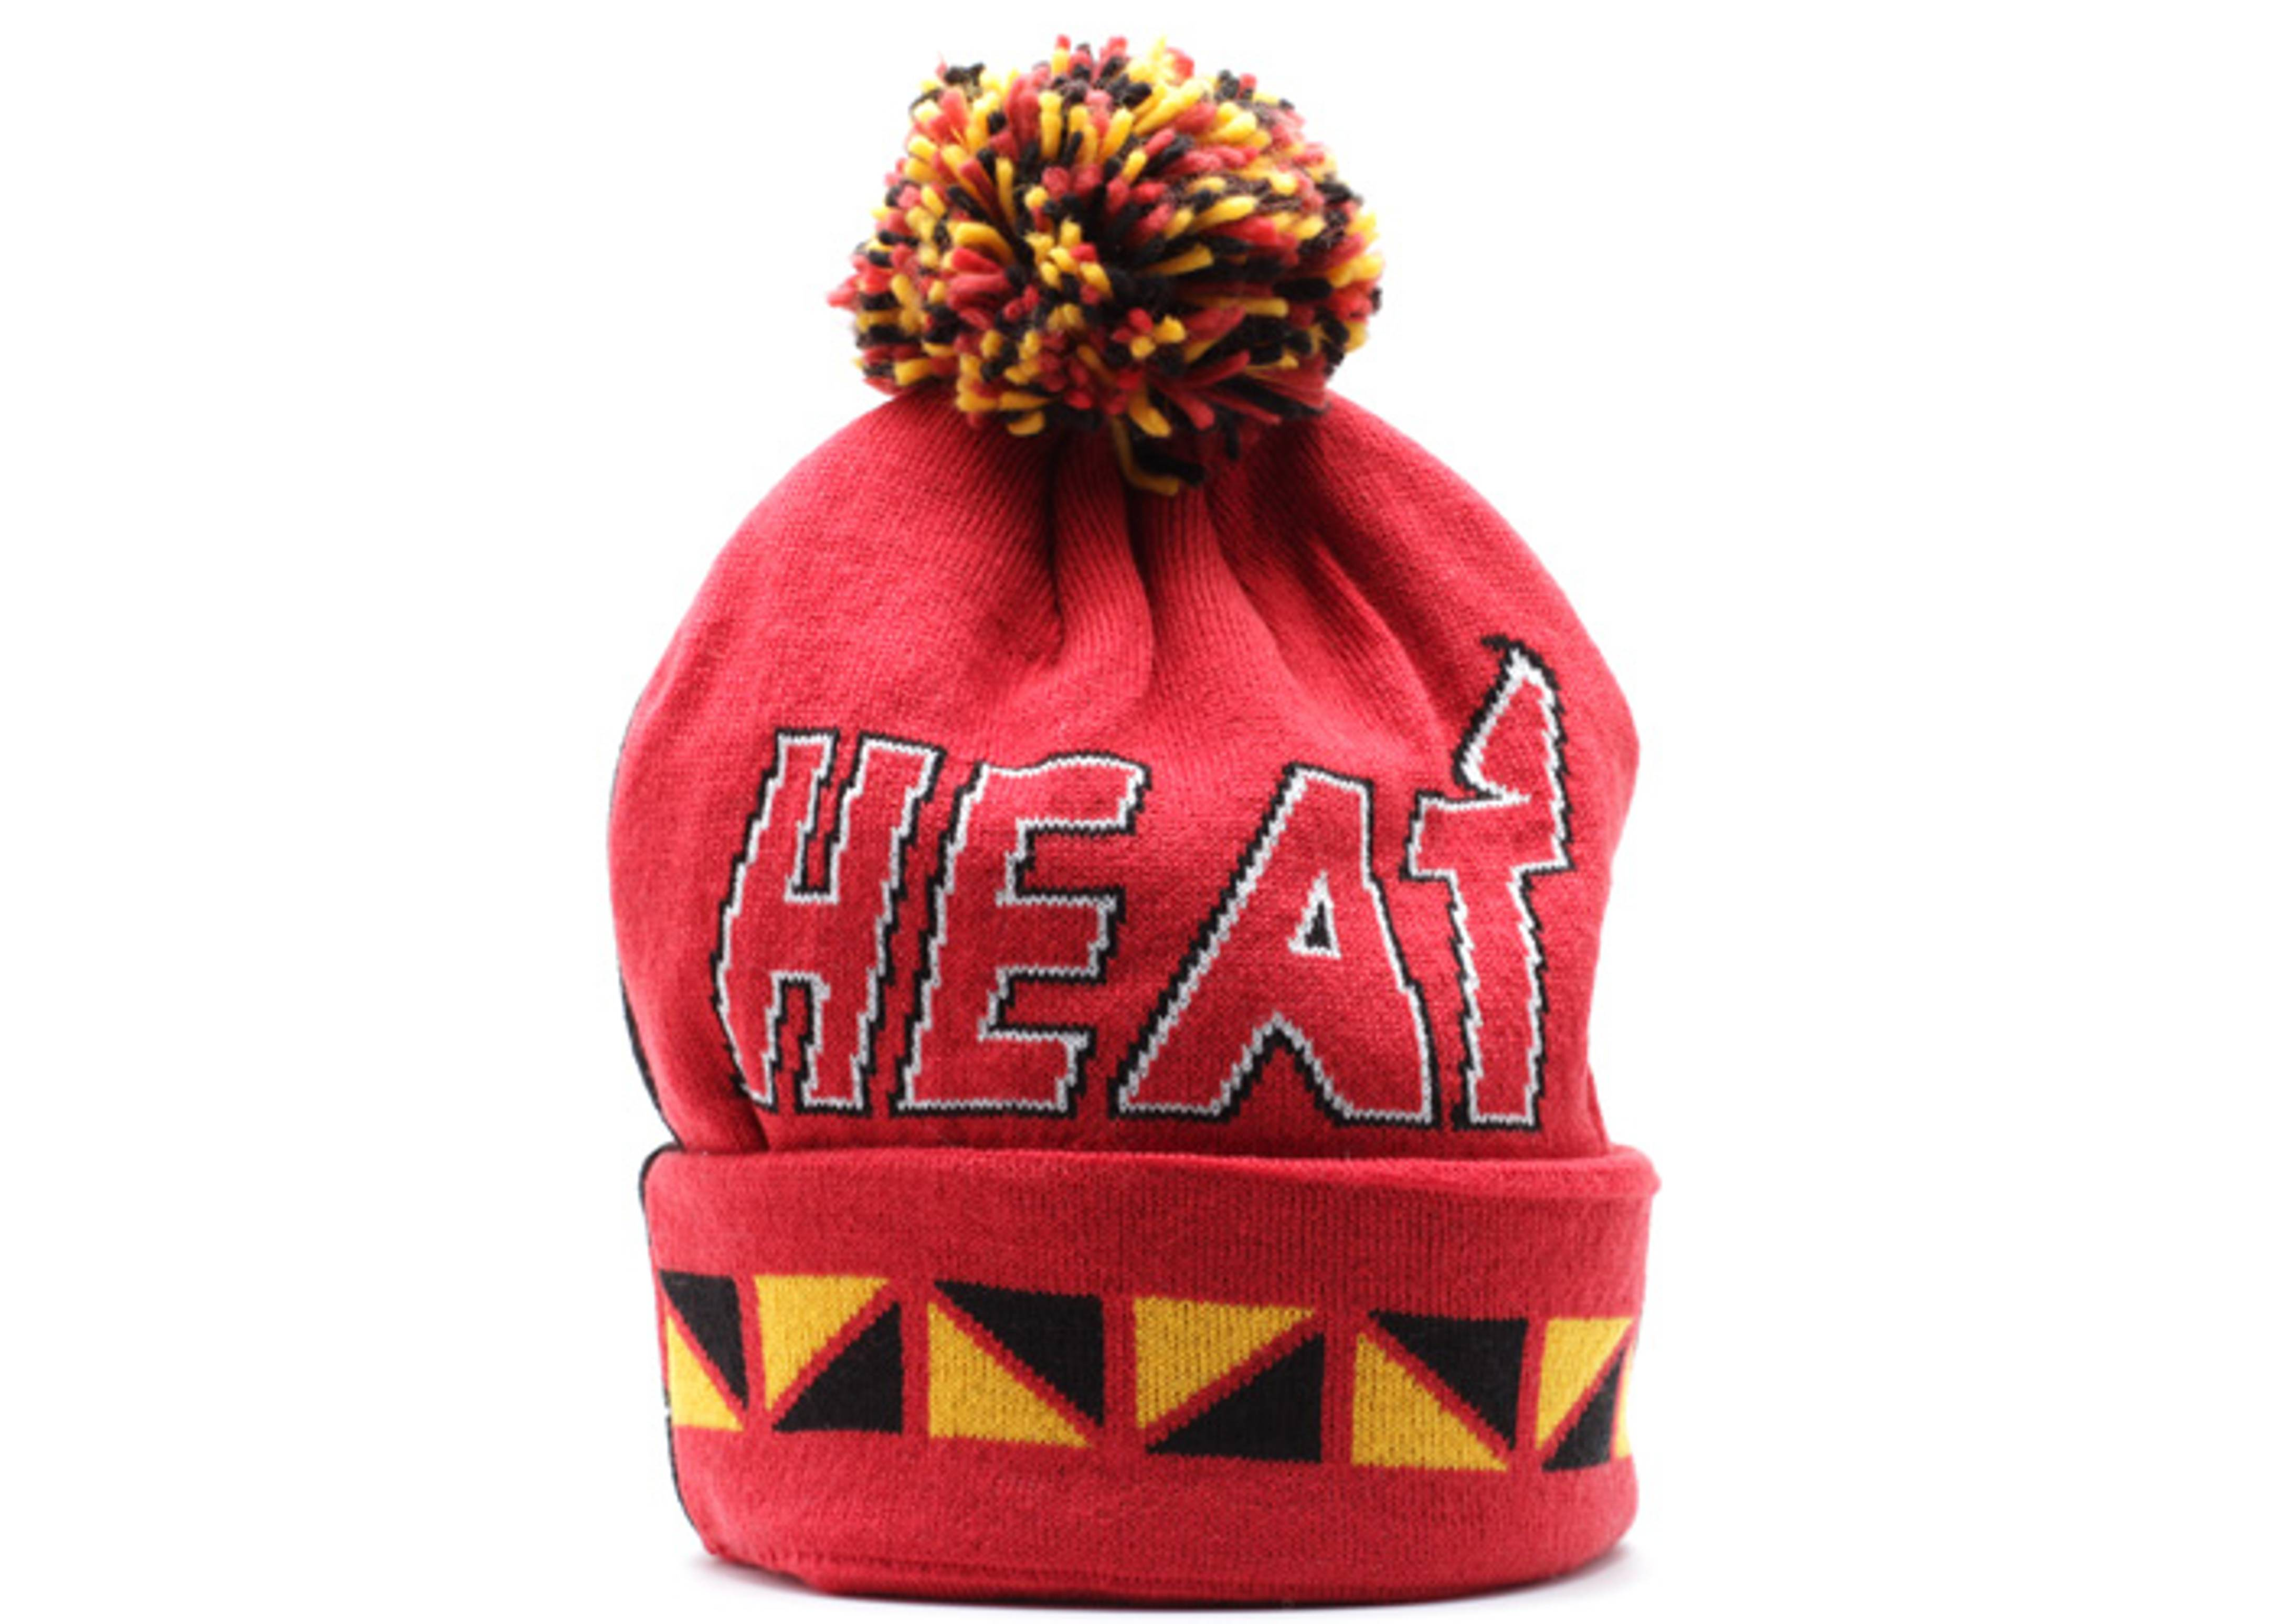 cheaper c060a 15c3e ... coupon code for miami heat cuffed pom knit beanie bf26e 65b59